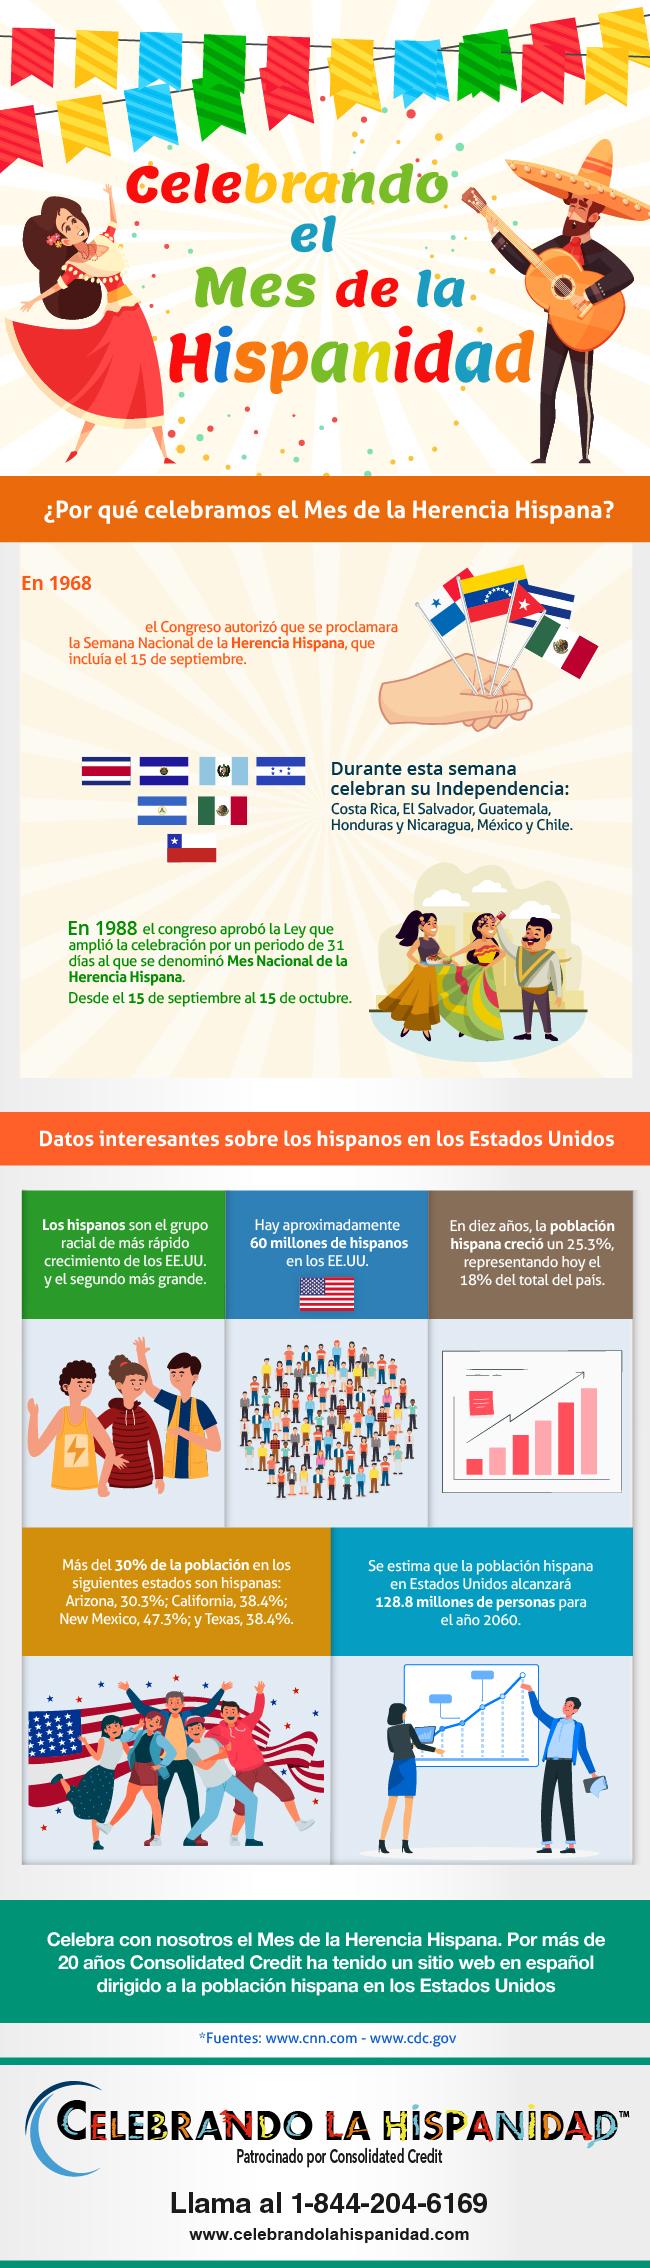 Celebrando el Mes de la Hispanidad 2020